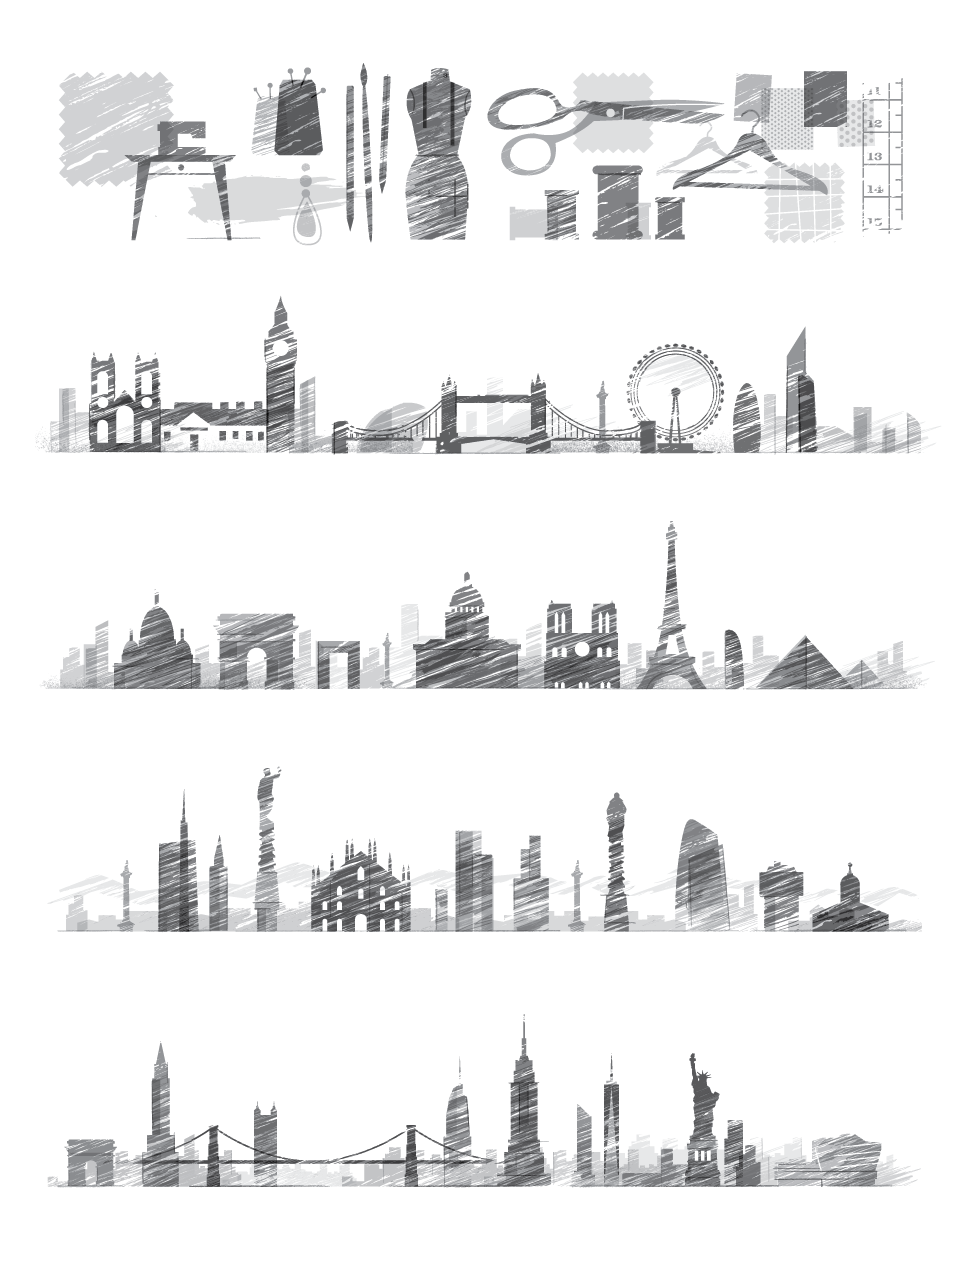 Emerging Designers, London, Paris, Milan, NYC (click for bigger view)